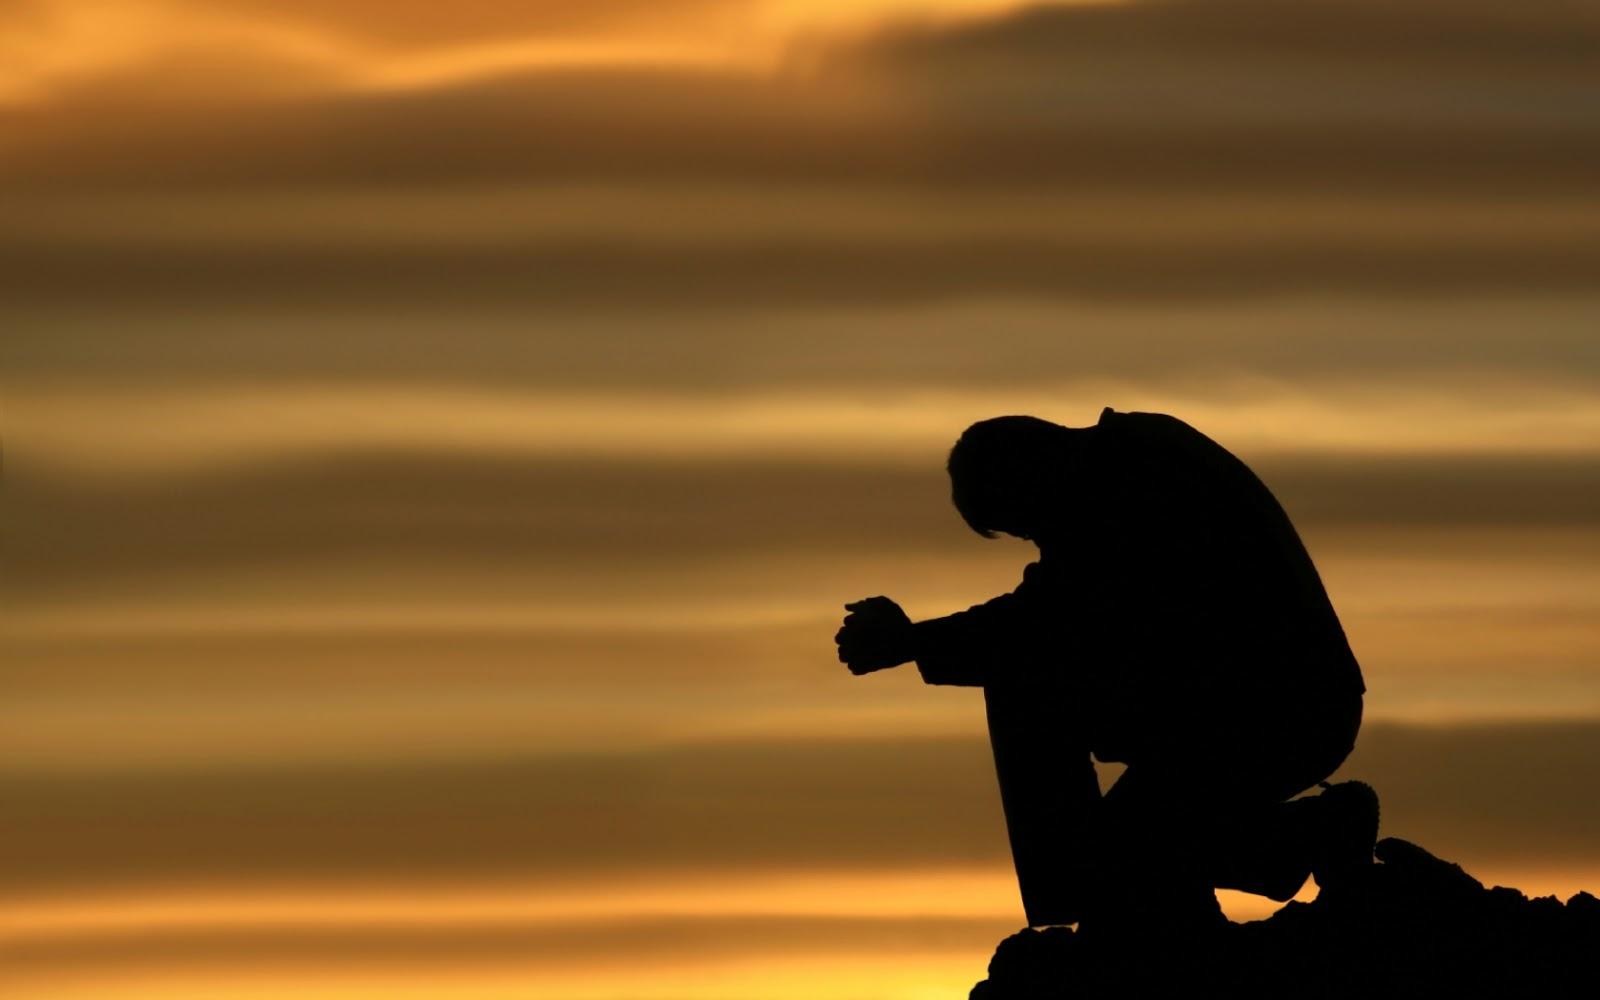 https://i1.wp.com/3.bp.blogspot.com/-dgZRZH7y5e4/URlDyF1jSjI/AAAAAAAABKA/76VI3Eb6ItM/s1600/prayer-warrior.jpg